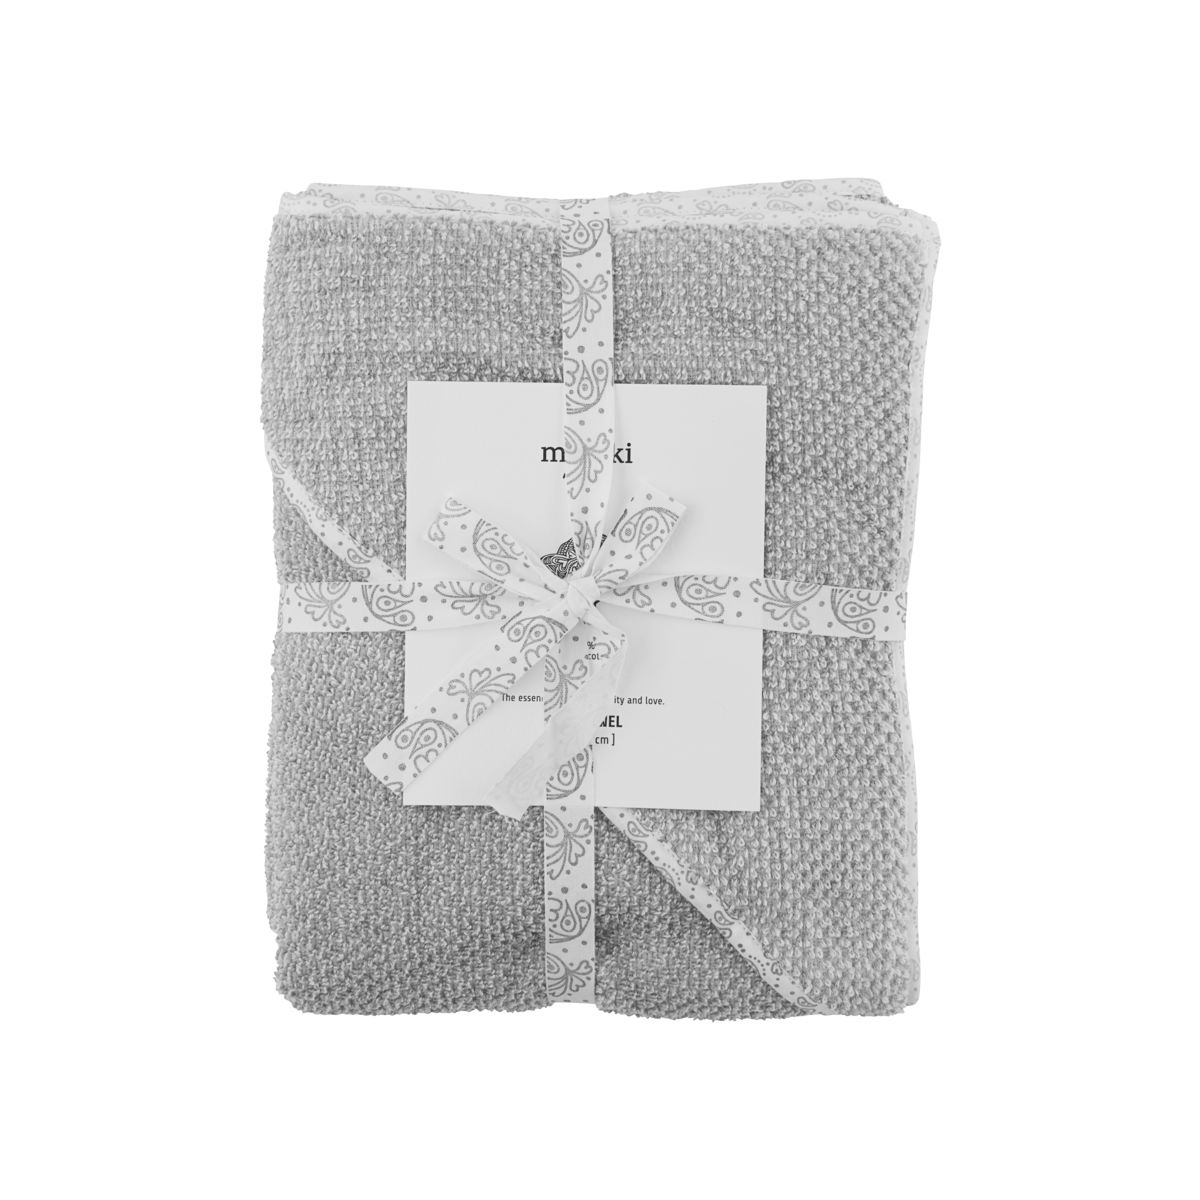 Image of   Baby håndklæde, Meraki mini, Grå, 100% økologisk bomuld, l: 80 cm, b: 80 cm